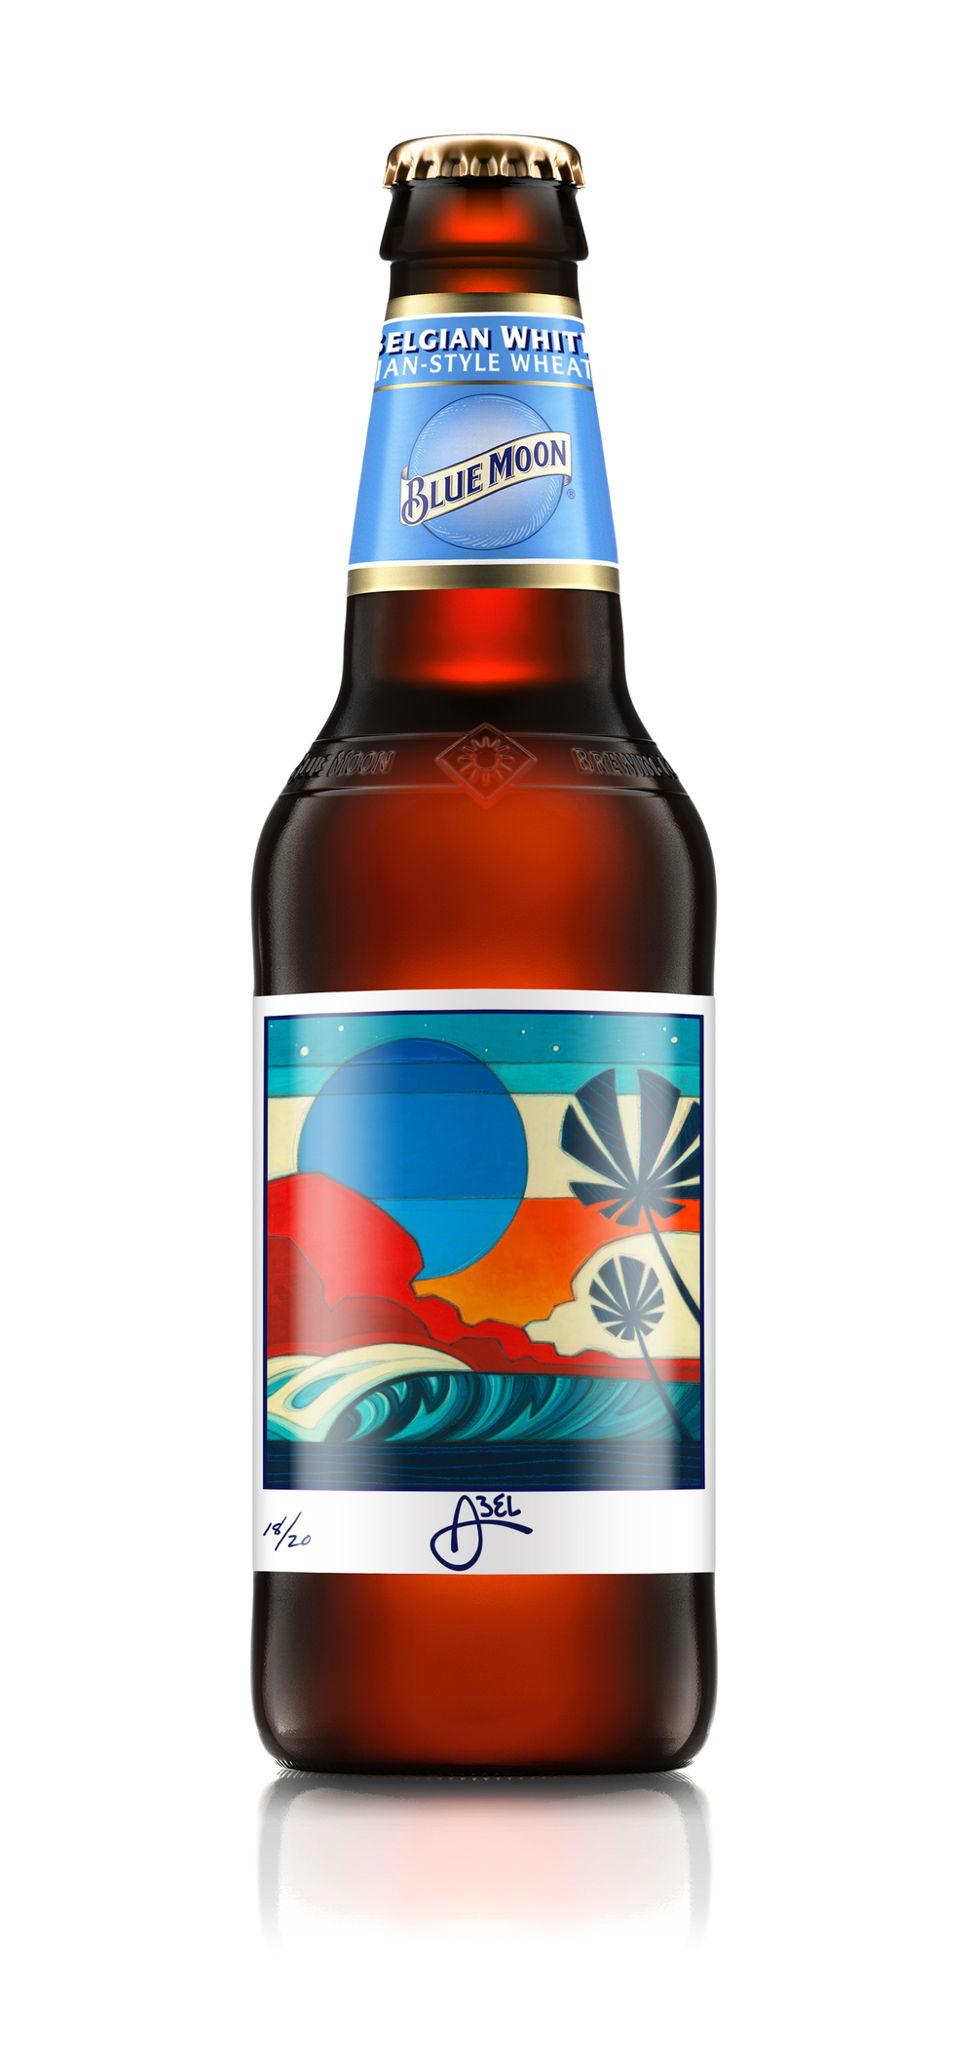 BMO-195A_Bottle_12z_Render_ErikAble_150401_FJ.jpg